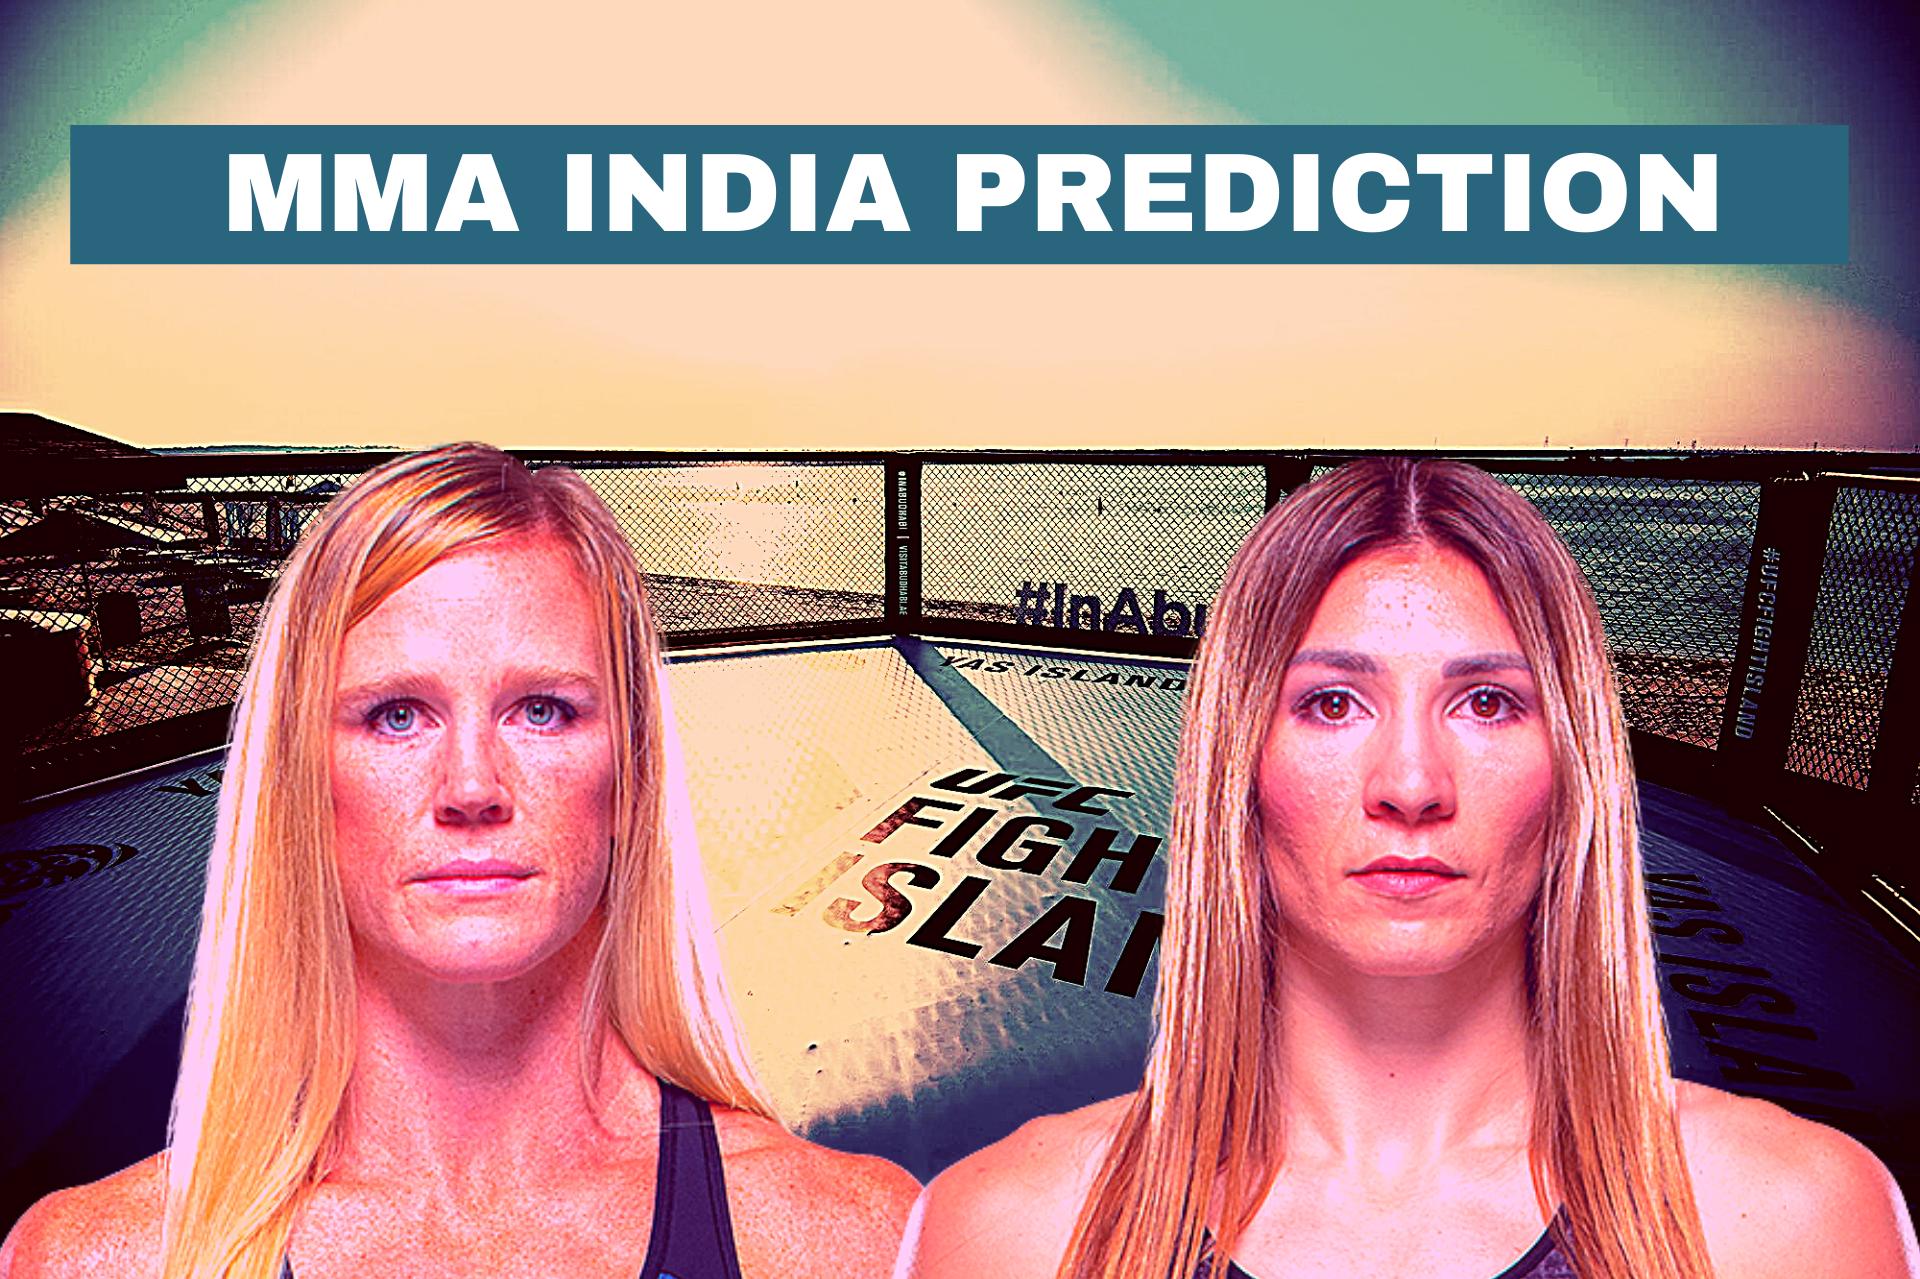 UFC Fight Island 4: Holm vs Aldana Odds, Predictions and Verdict - Holm